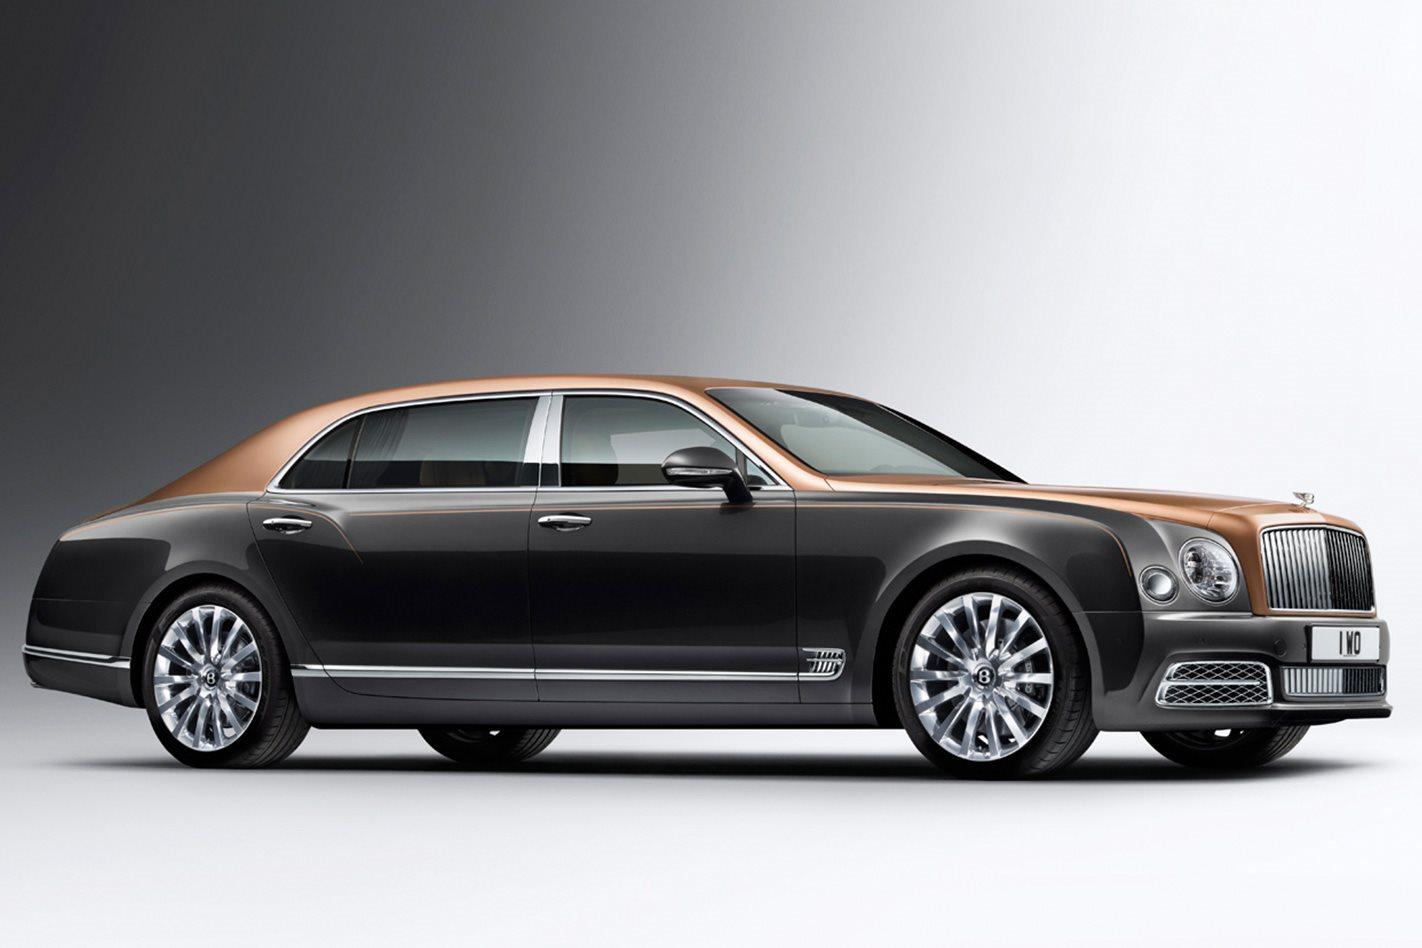 100 bentley mulsanne grand limousine shanghai 2013. Black Bedroom Furniture Sets. Home Design Ideas